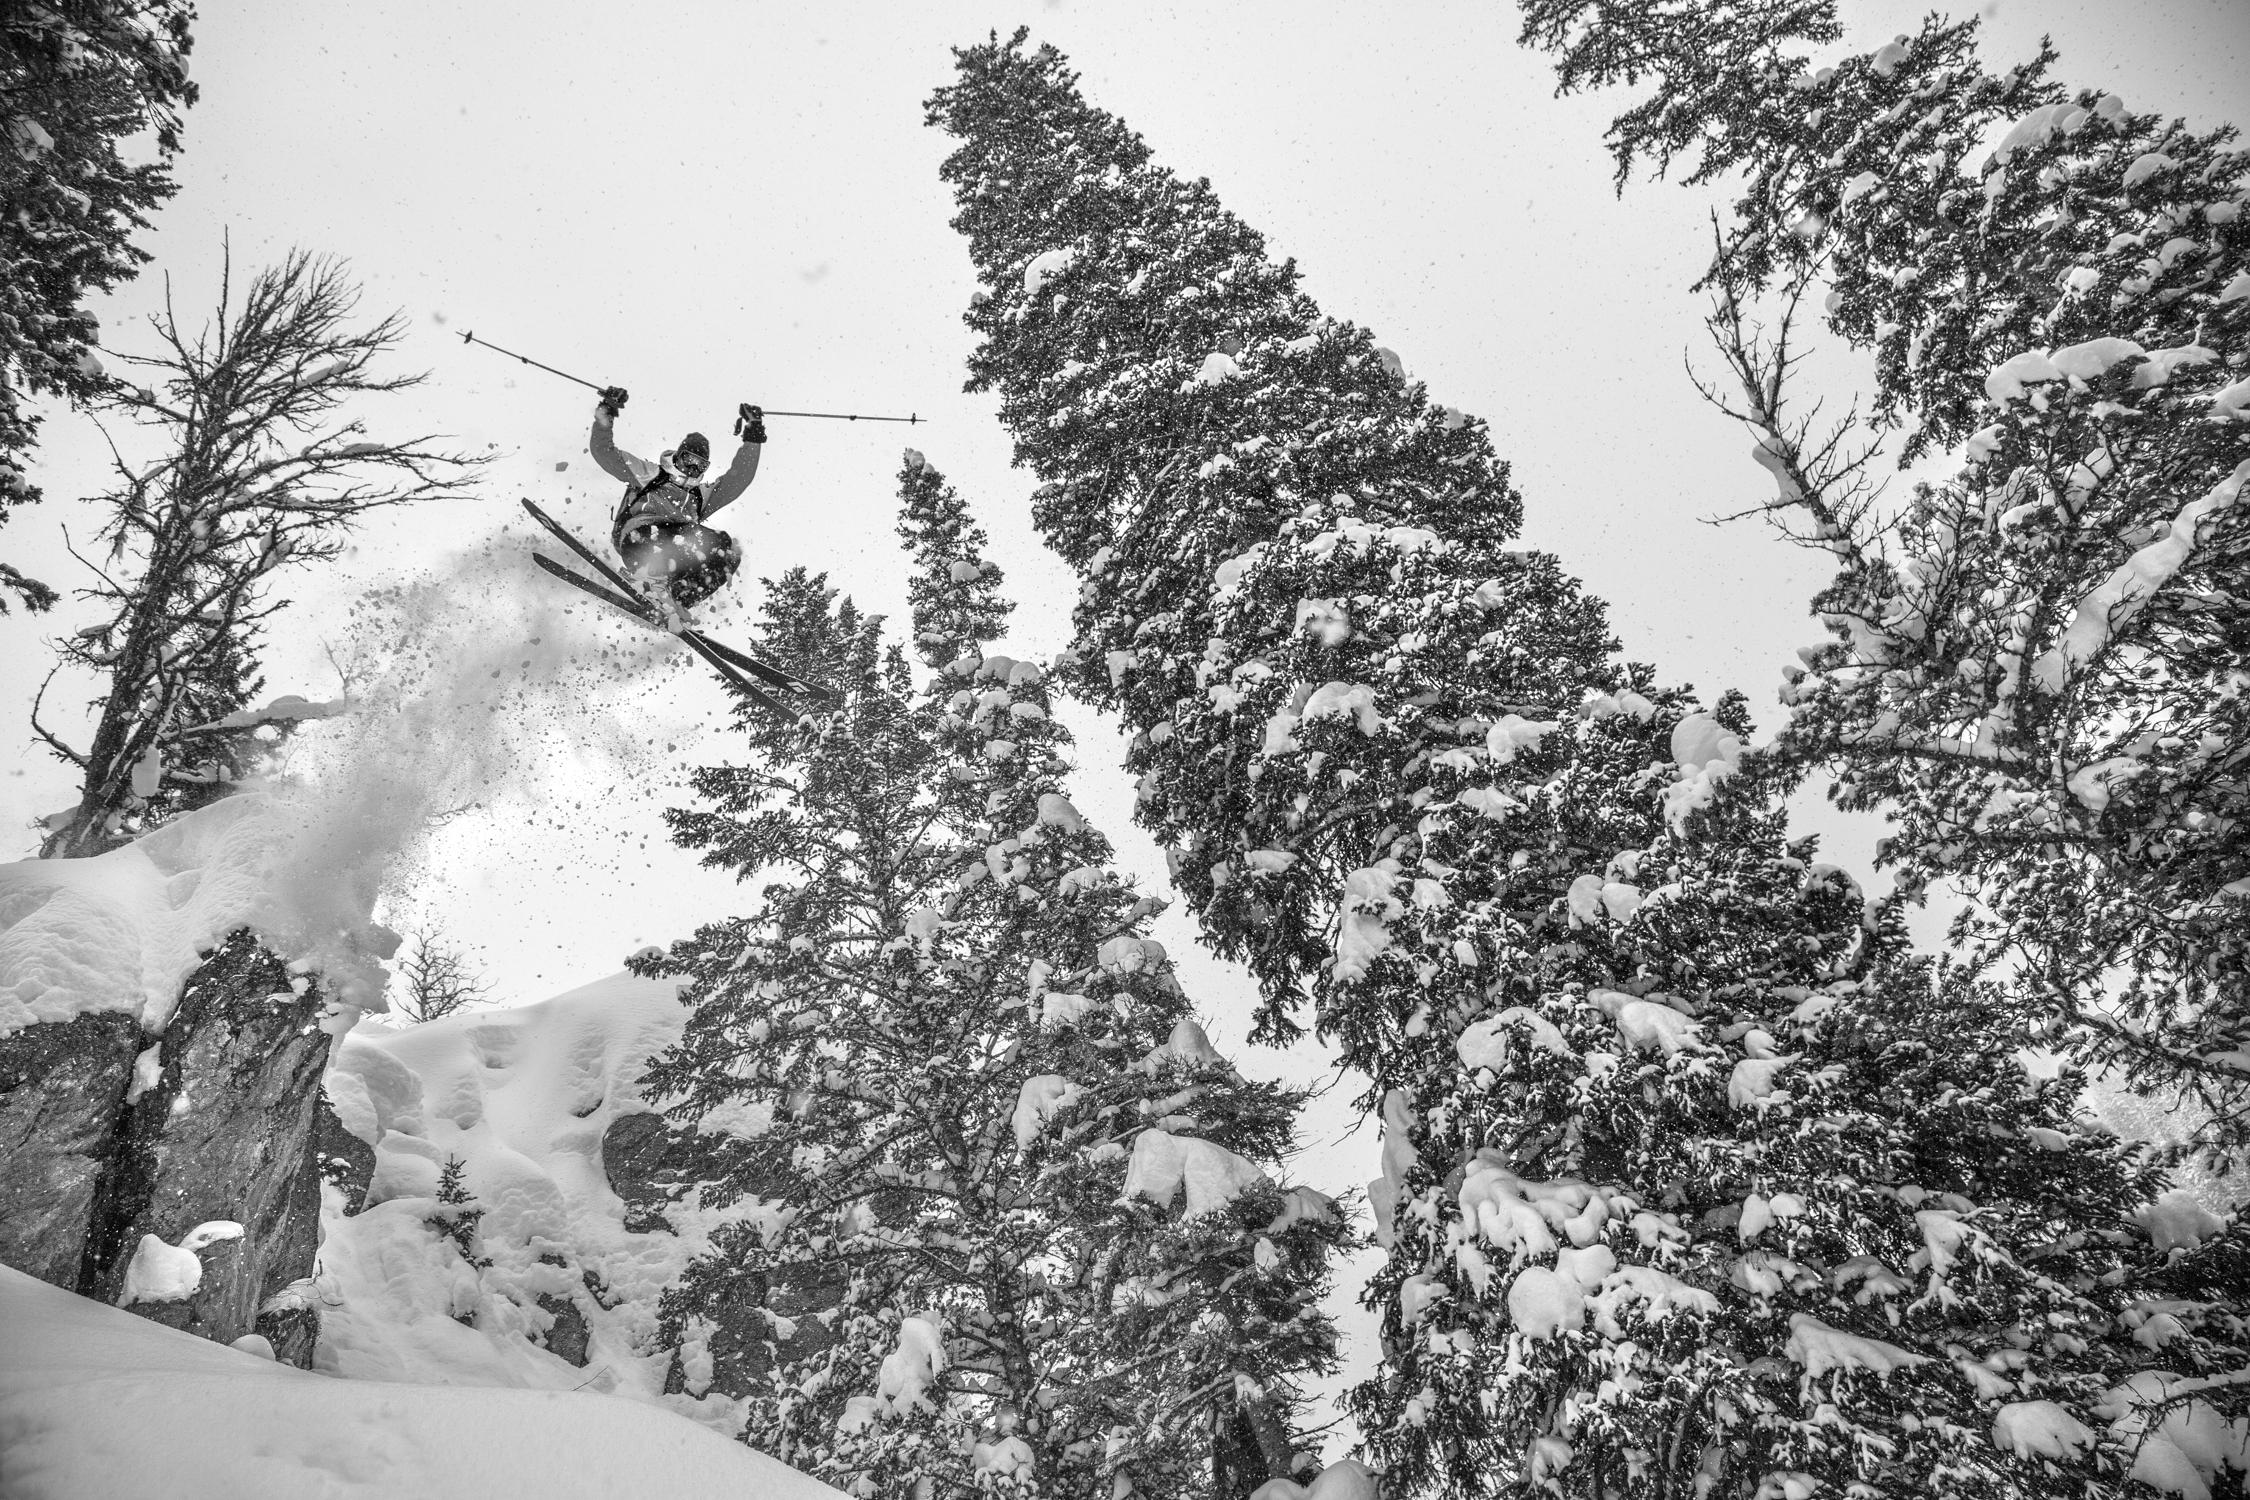 Teton Pass, WY